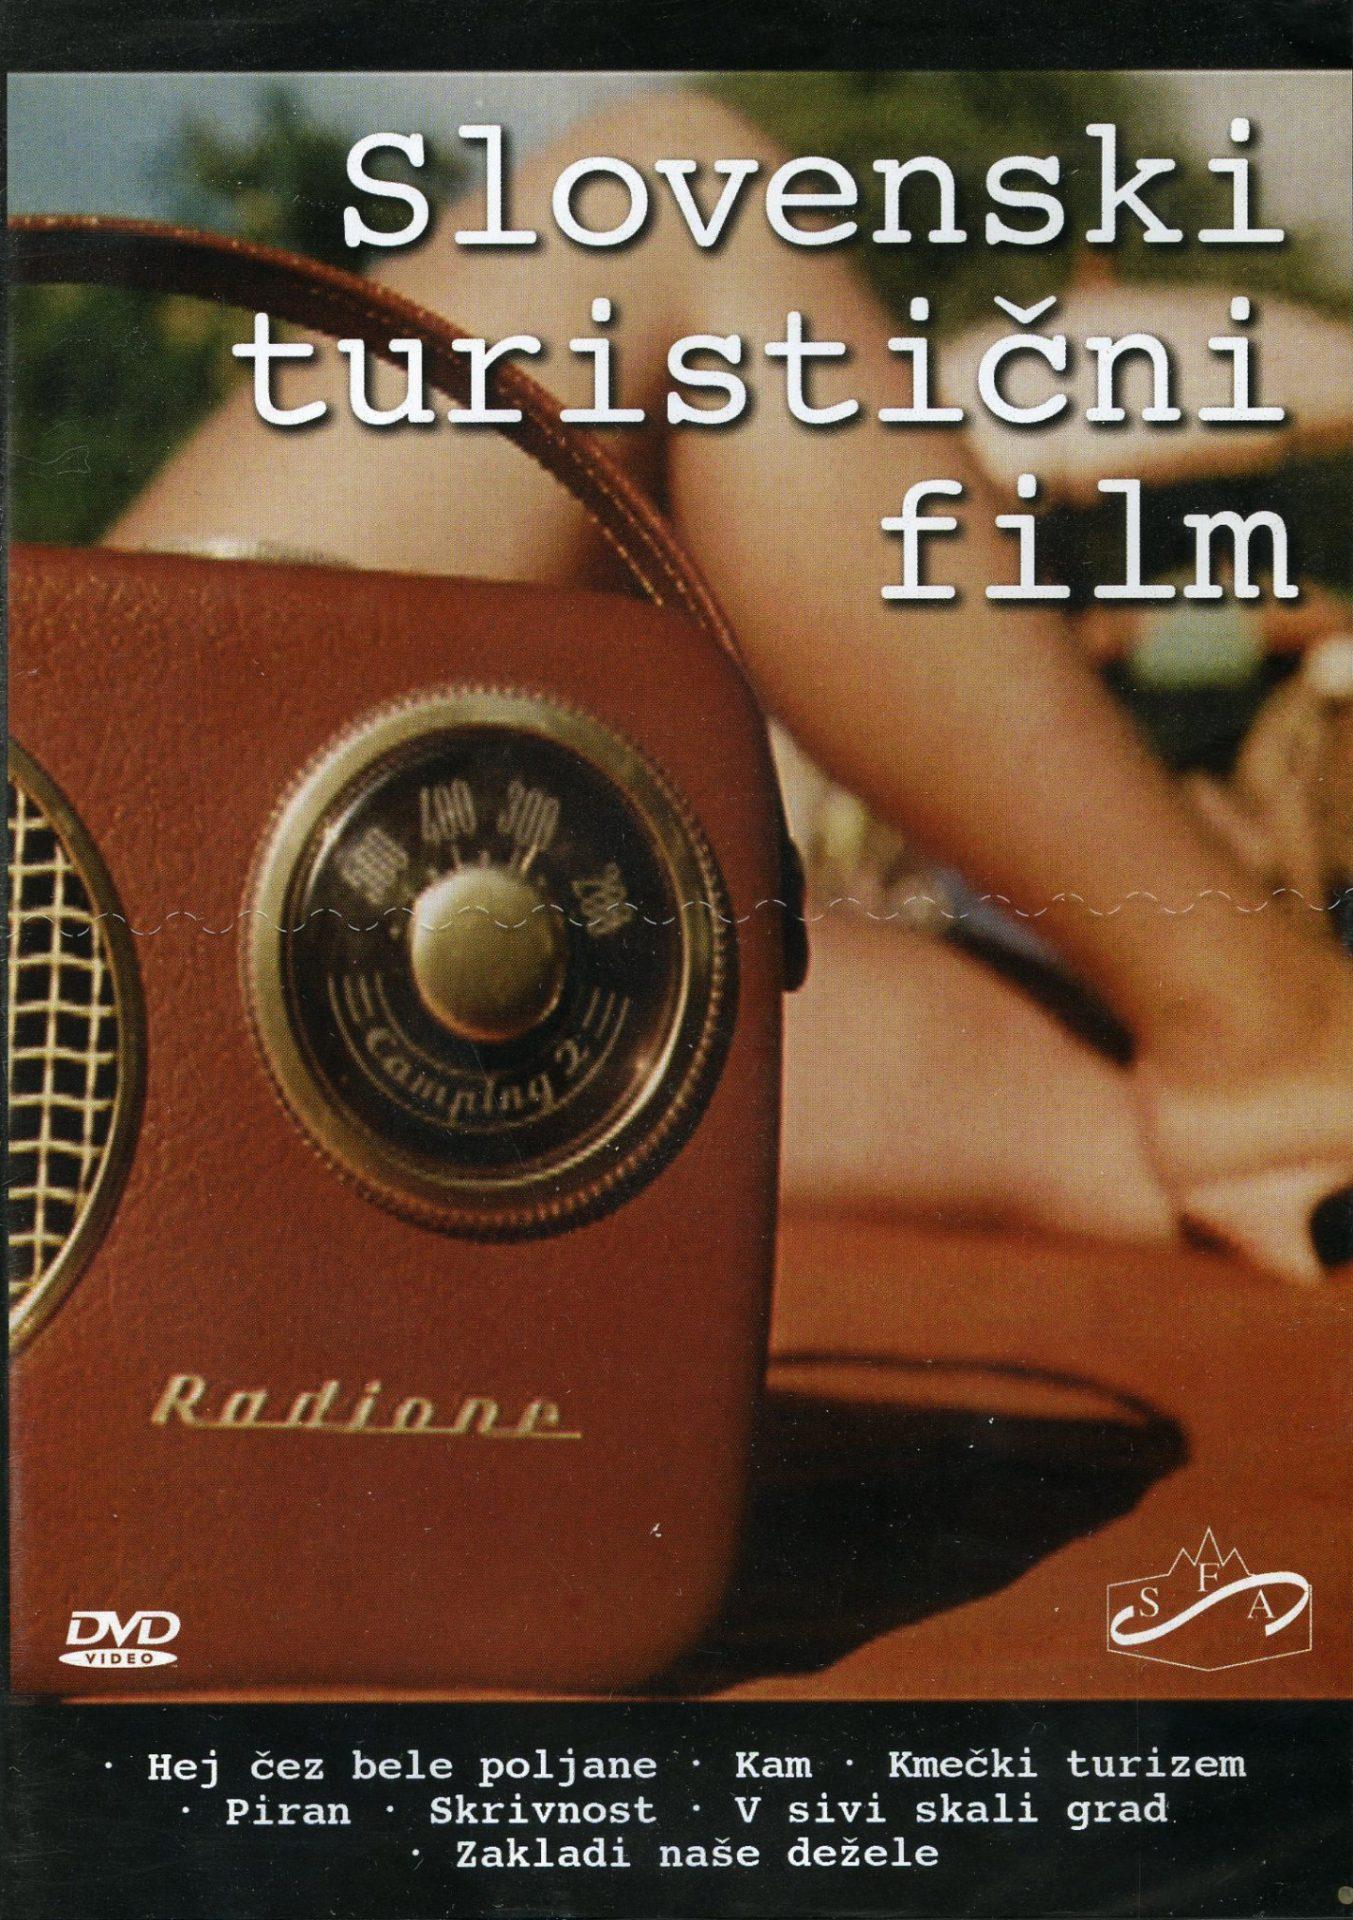 Slovenski turistični film - DVDSlovenia tourist film - DVD